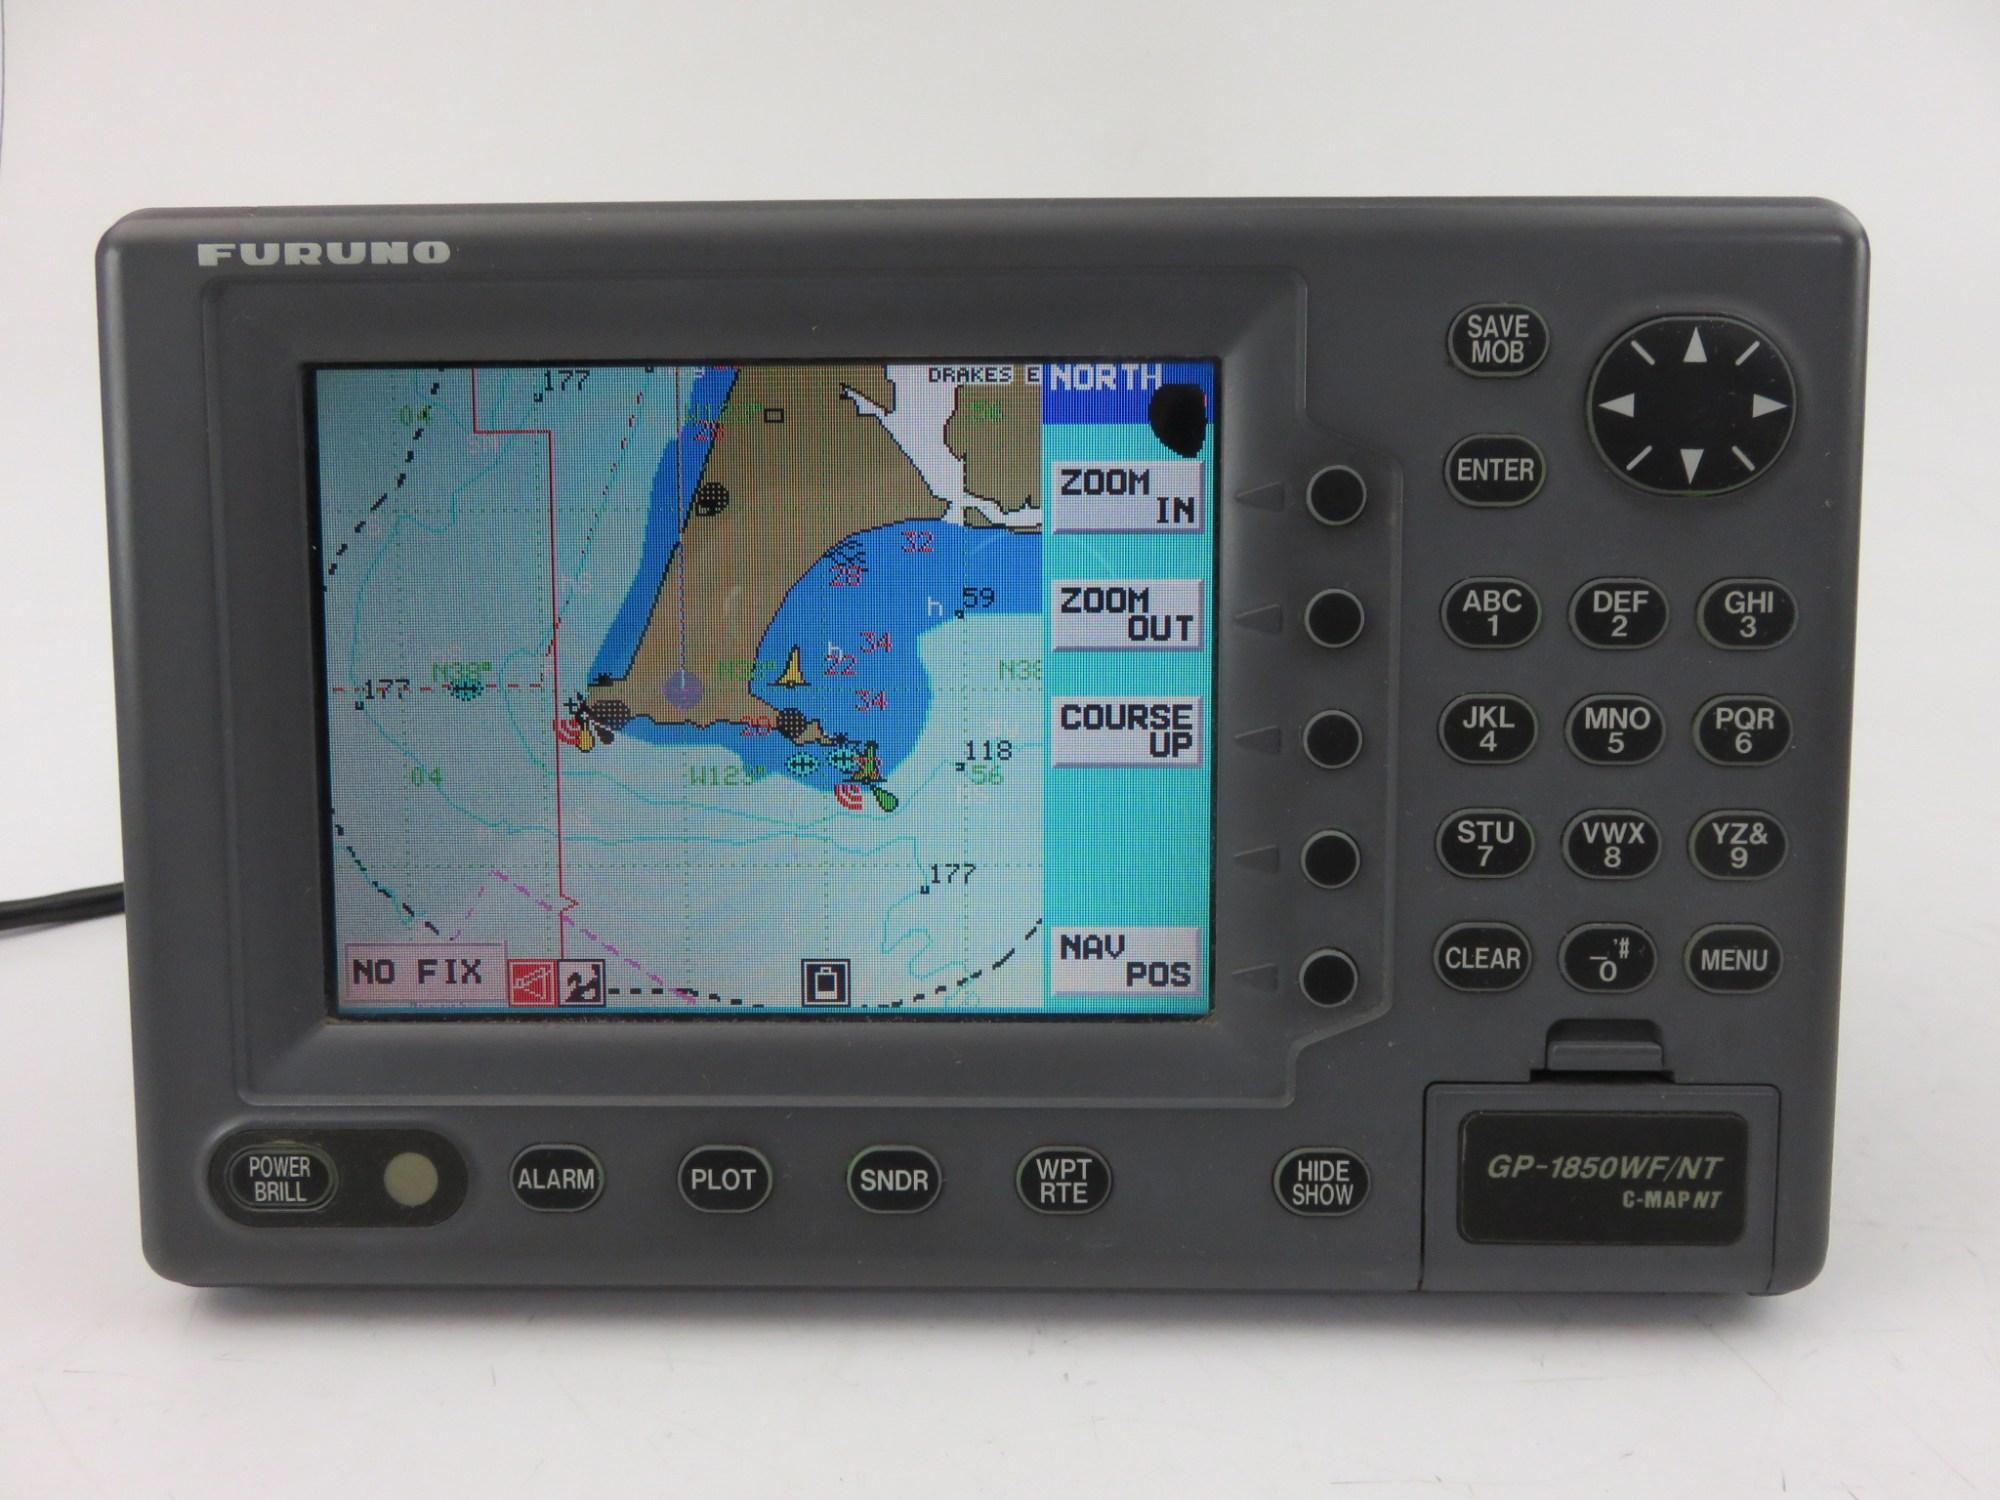 hight resolution of details about furuno gp 1850wf 7 ldc gps waas fishfinder chartplotter mfd display